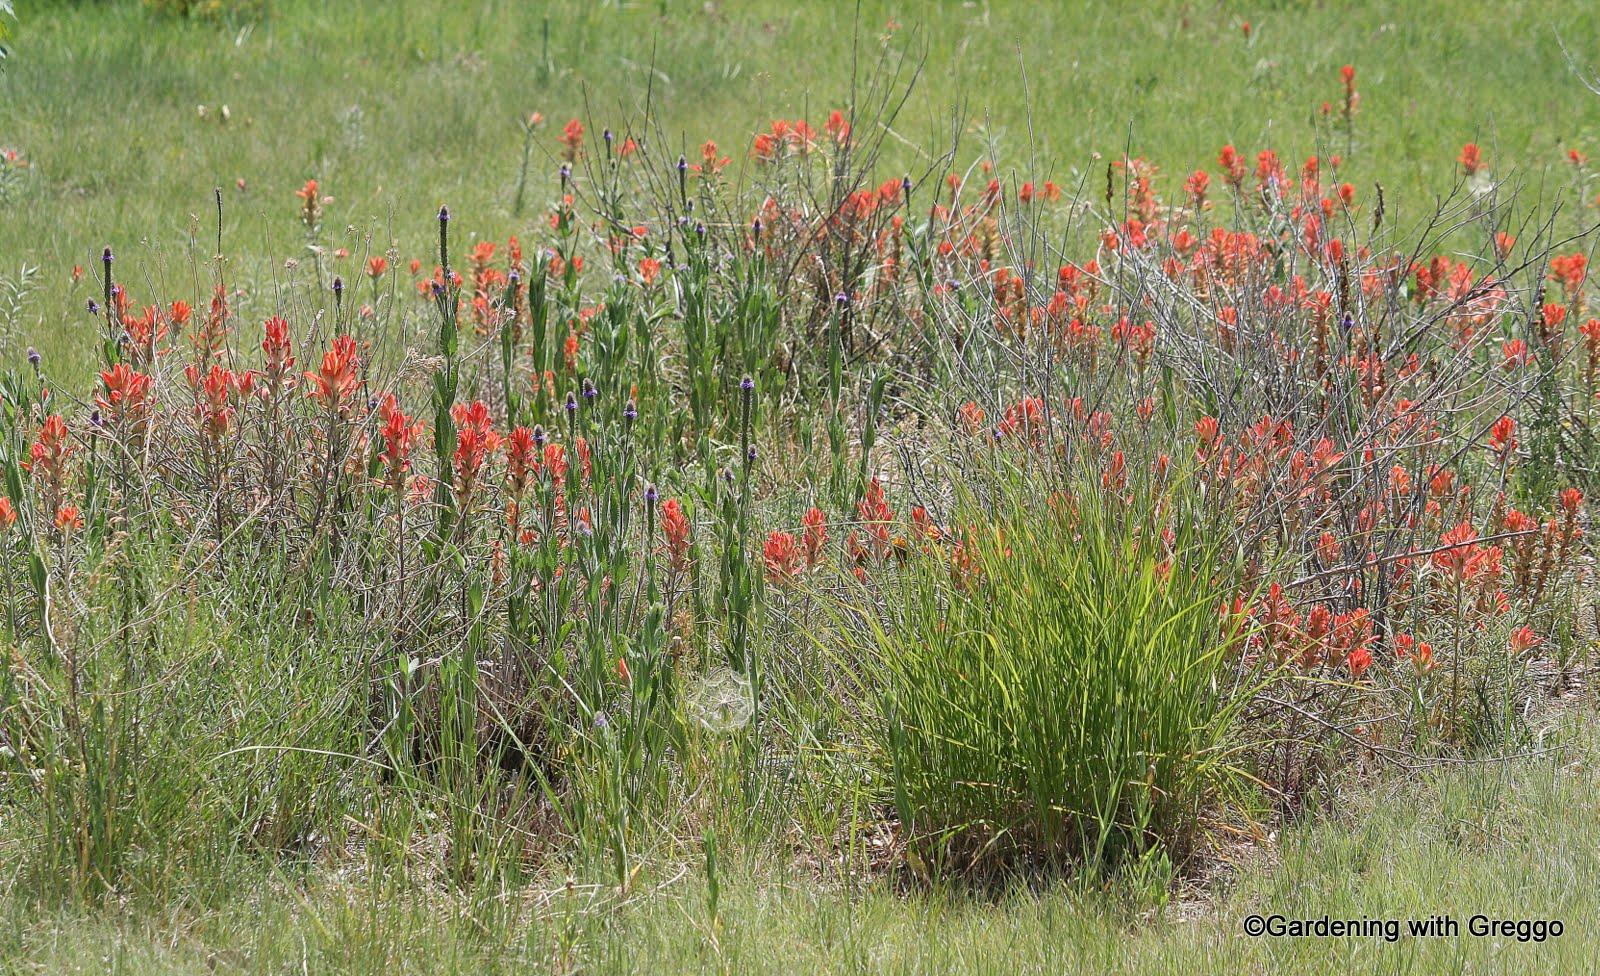 Gardening with Greggo Cheyenne Botanical Gardens